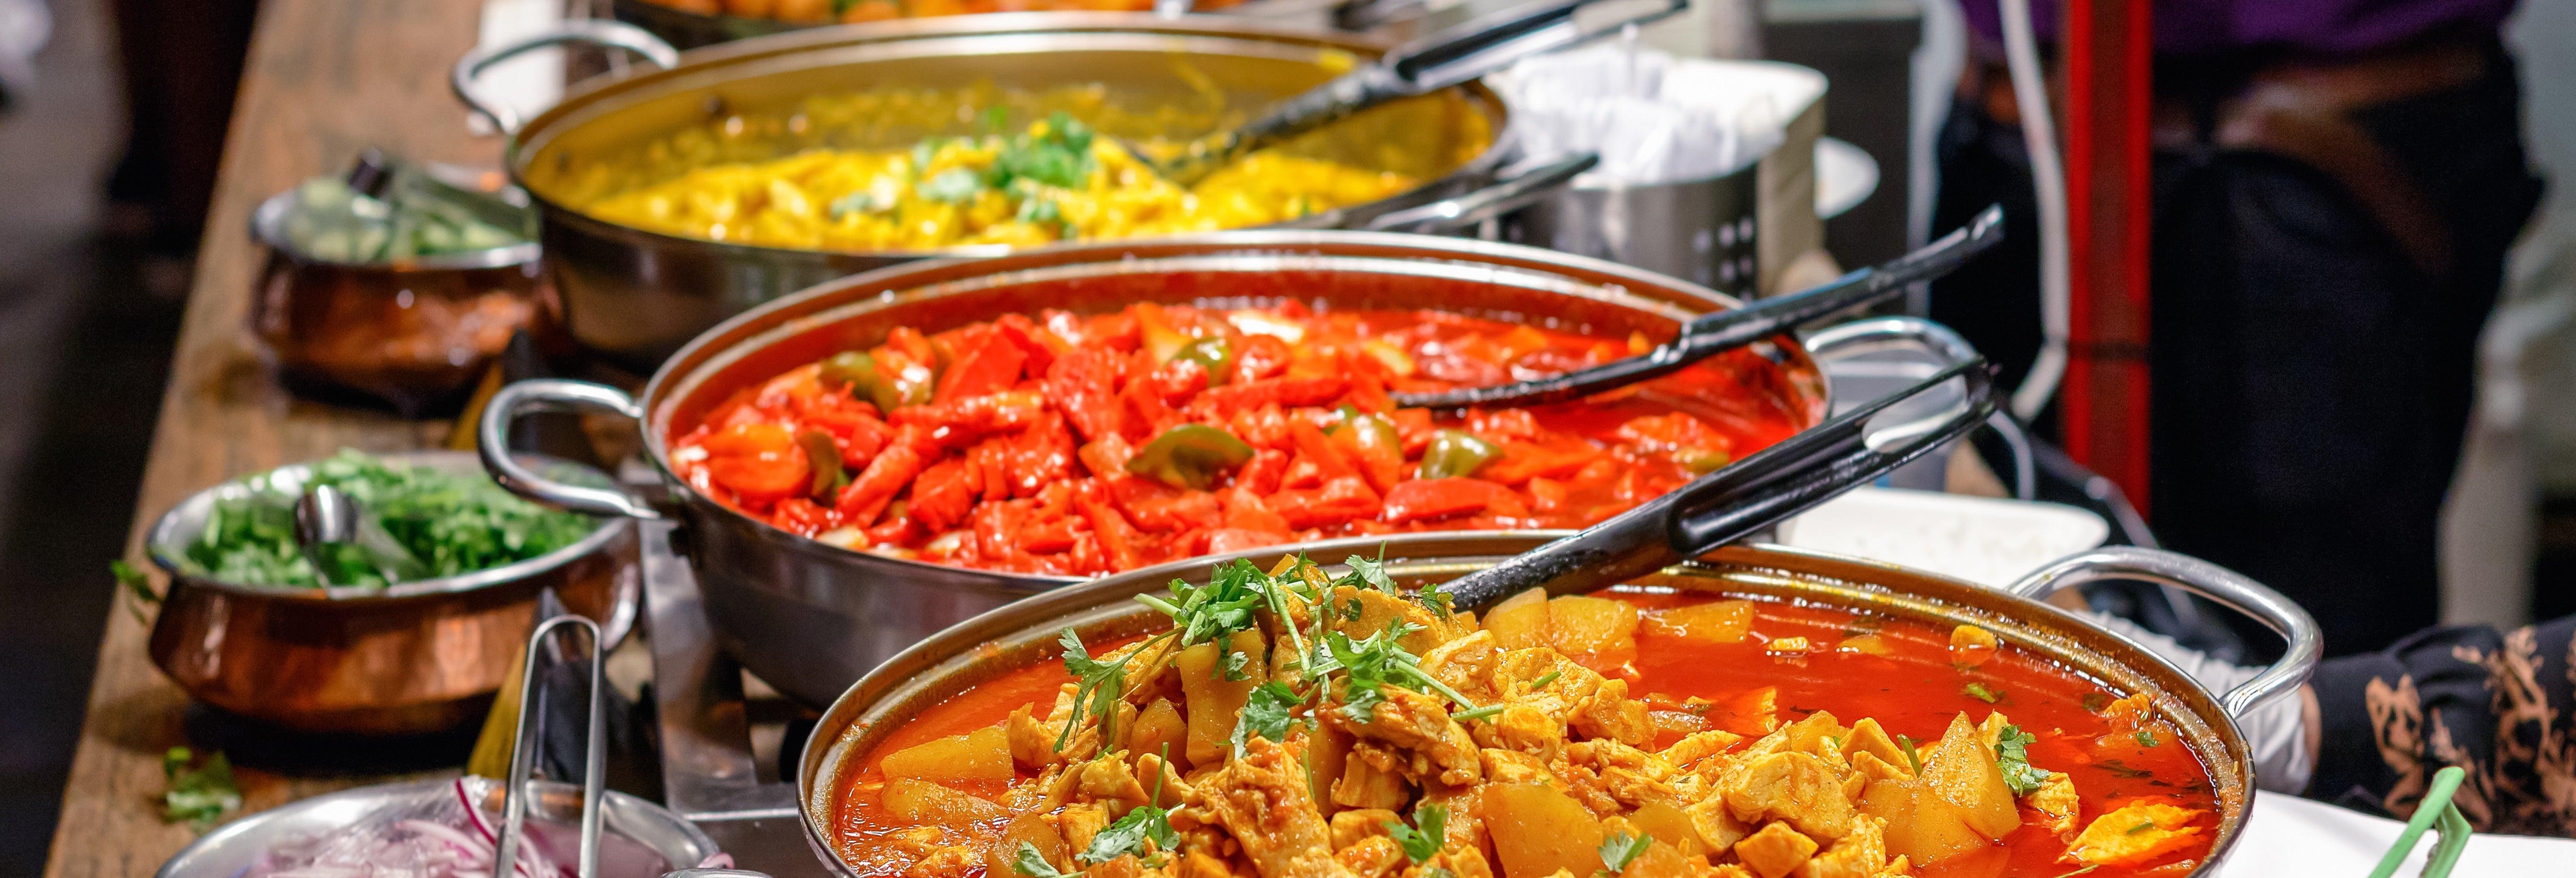 Tour gastronómico por Jodhpur